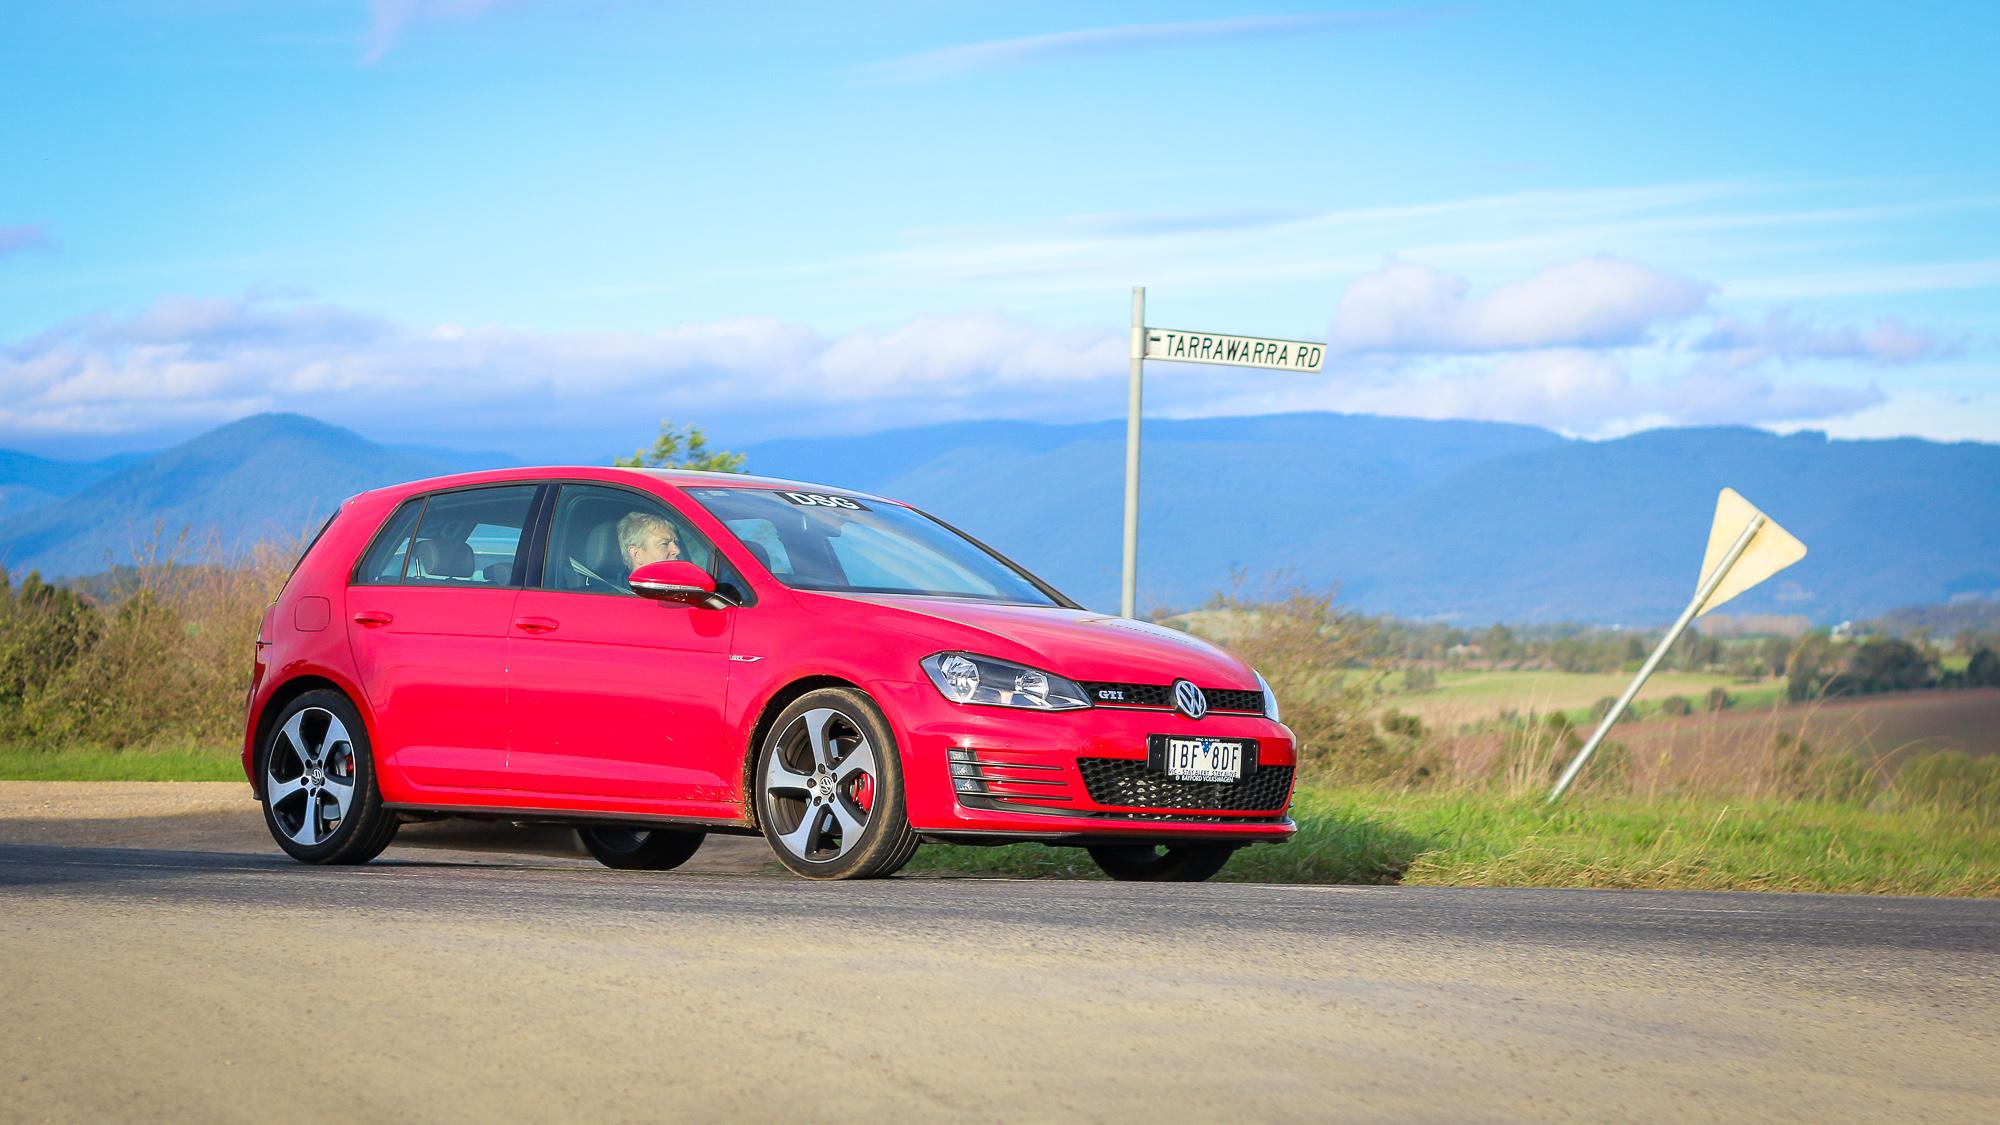 Volkswagen Golf GTI gearbox comparison : Manual v DSG - Photos